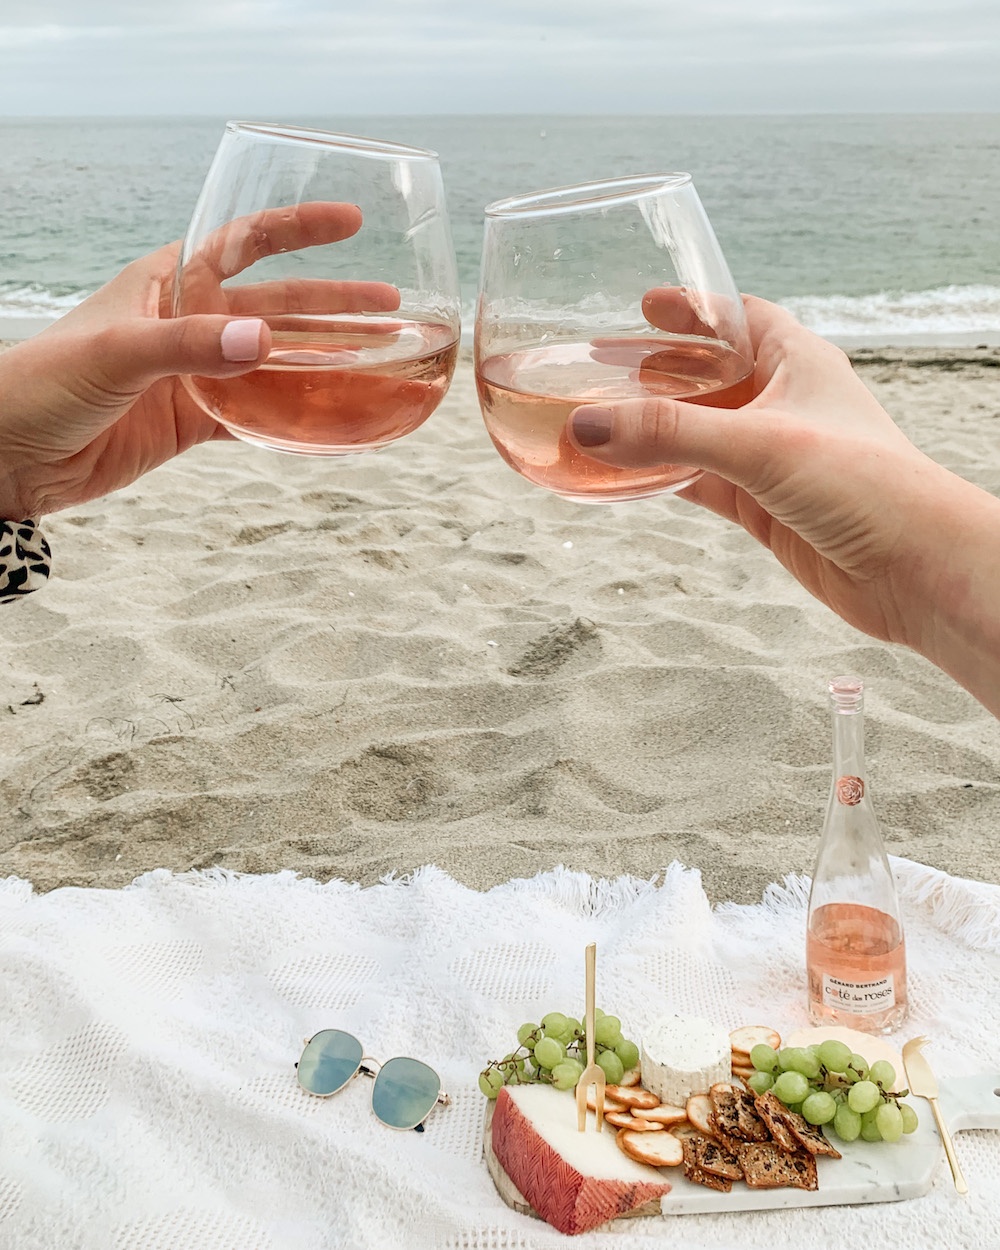 beach picnic aesthetic